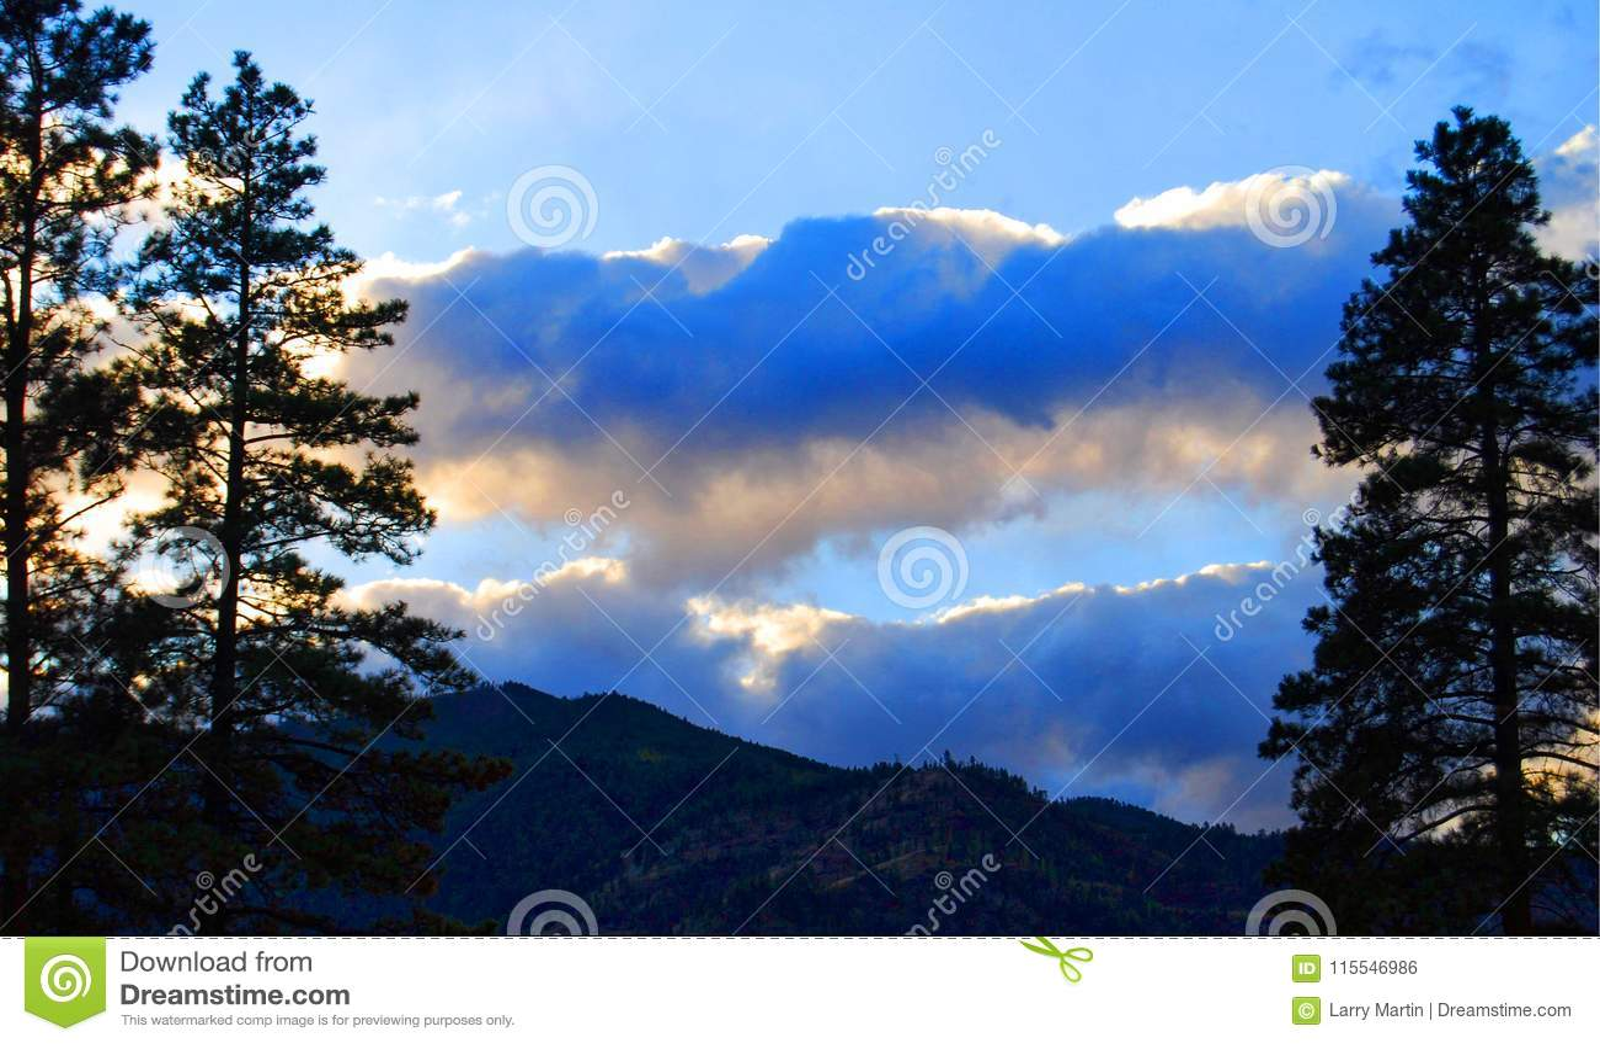 Sapphire Mountains Montana Map.Sunset Over Sapphire Mountains Montana Stock Photo Image Of